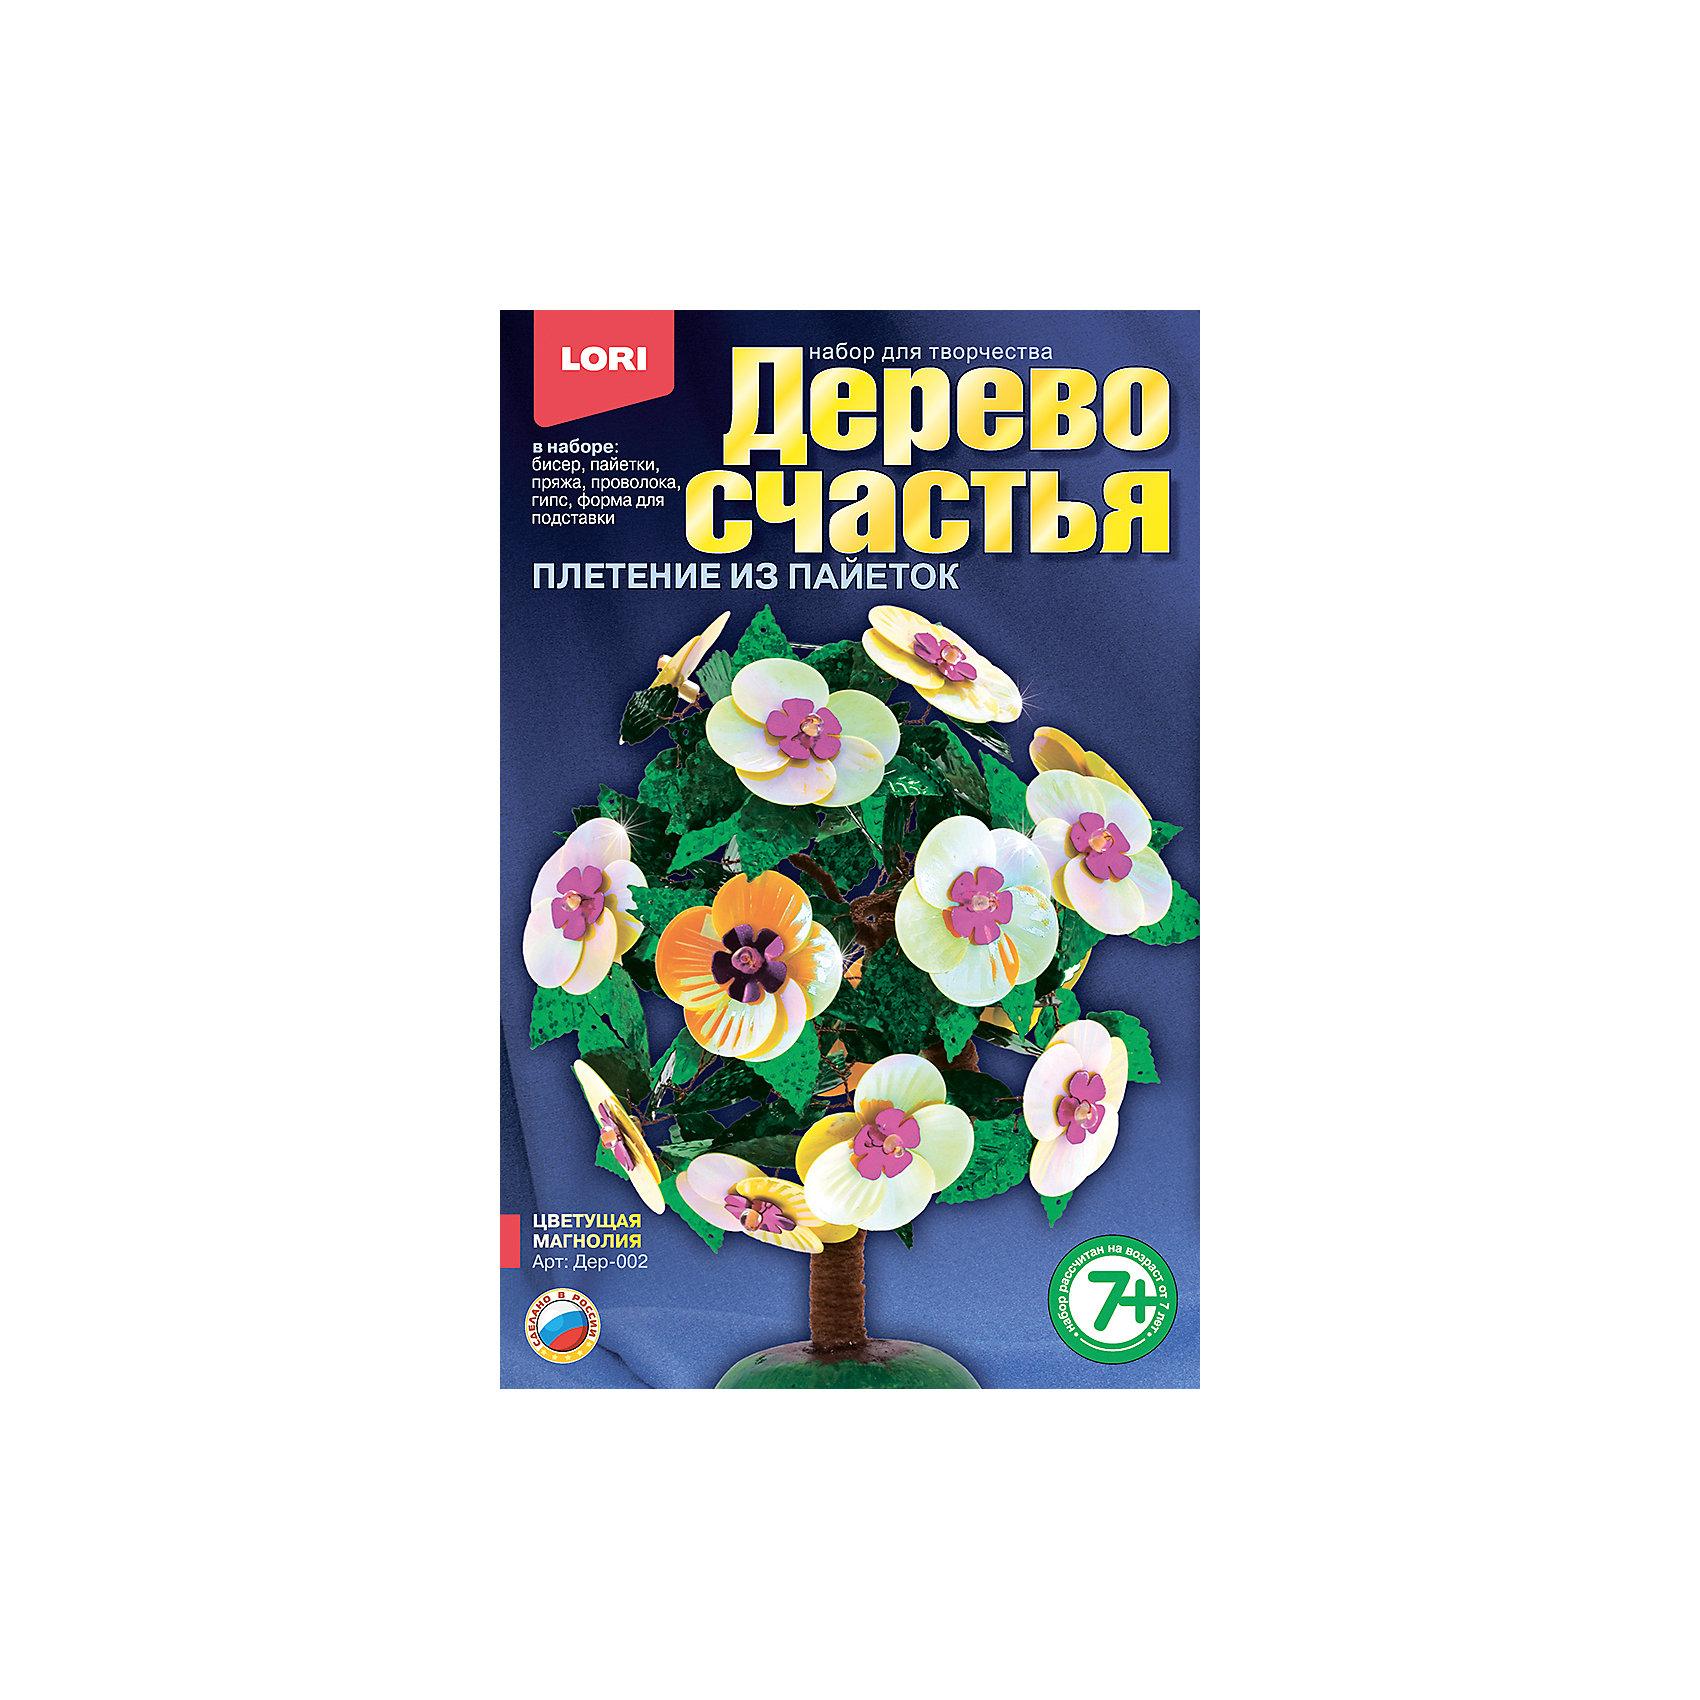 LORI Дерево счастья Цветущая магнолия lori фоторамки из гипса на клумбе